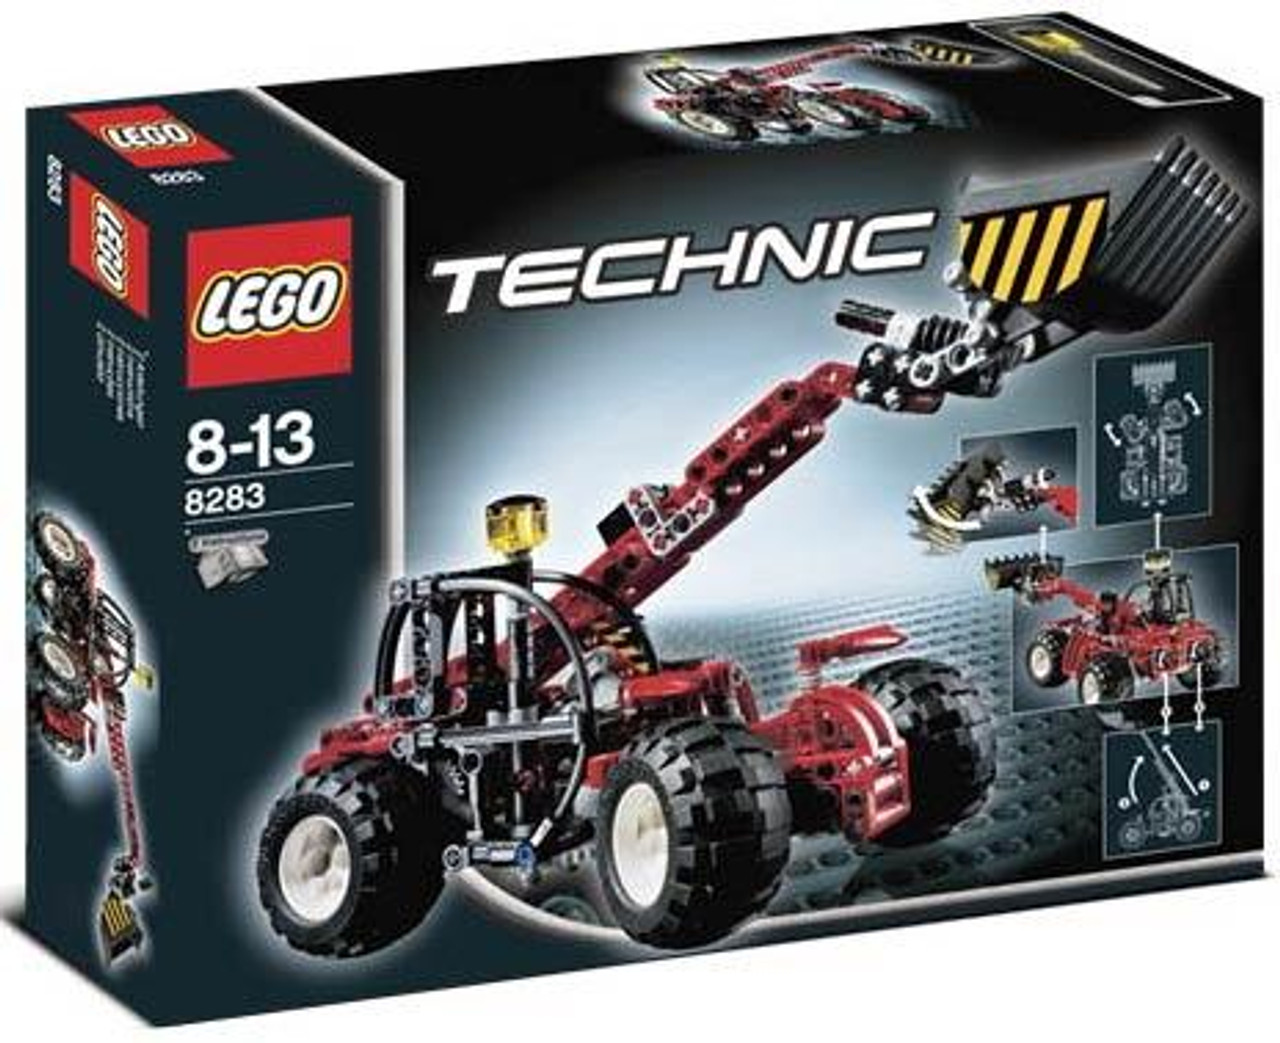 LEGO Technic Telehandler Set #8283 [8283]